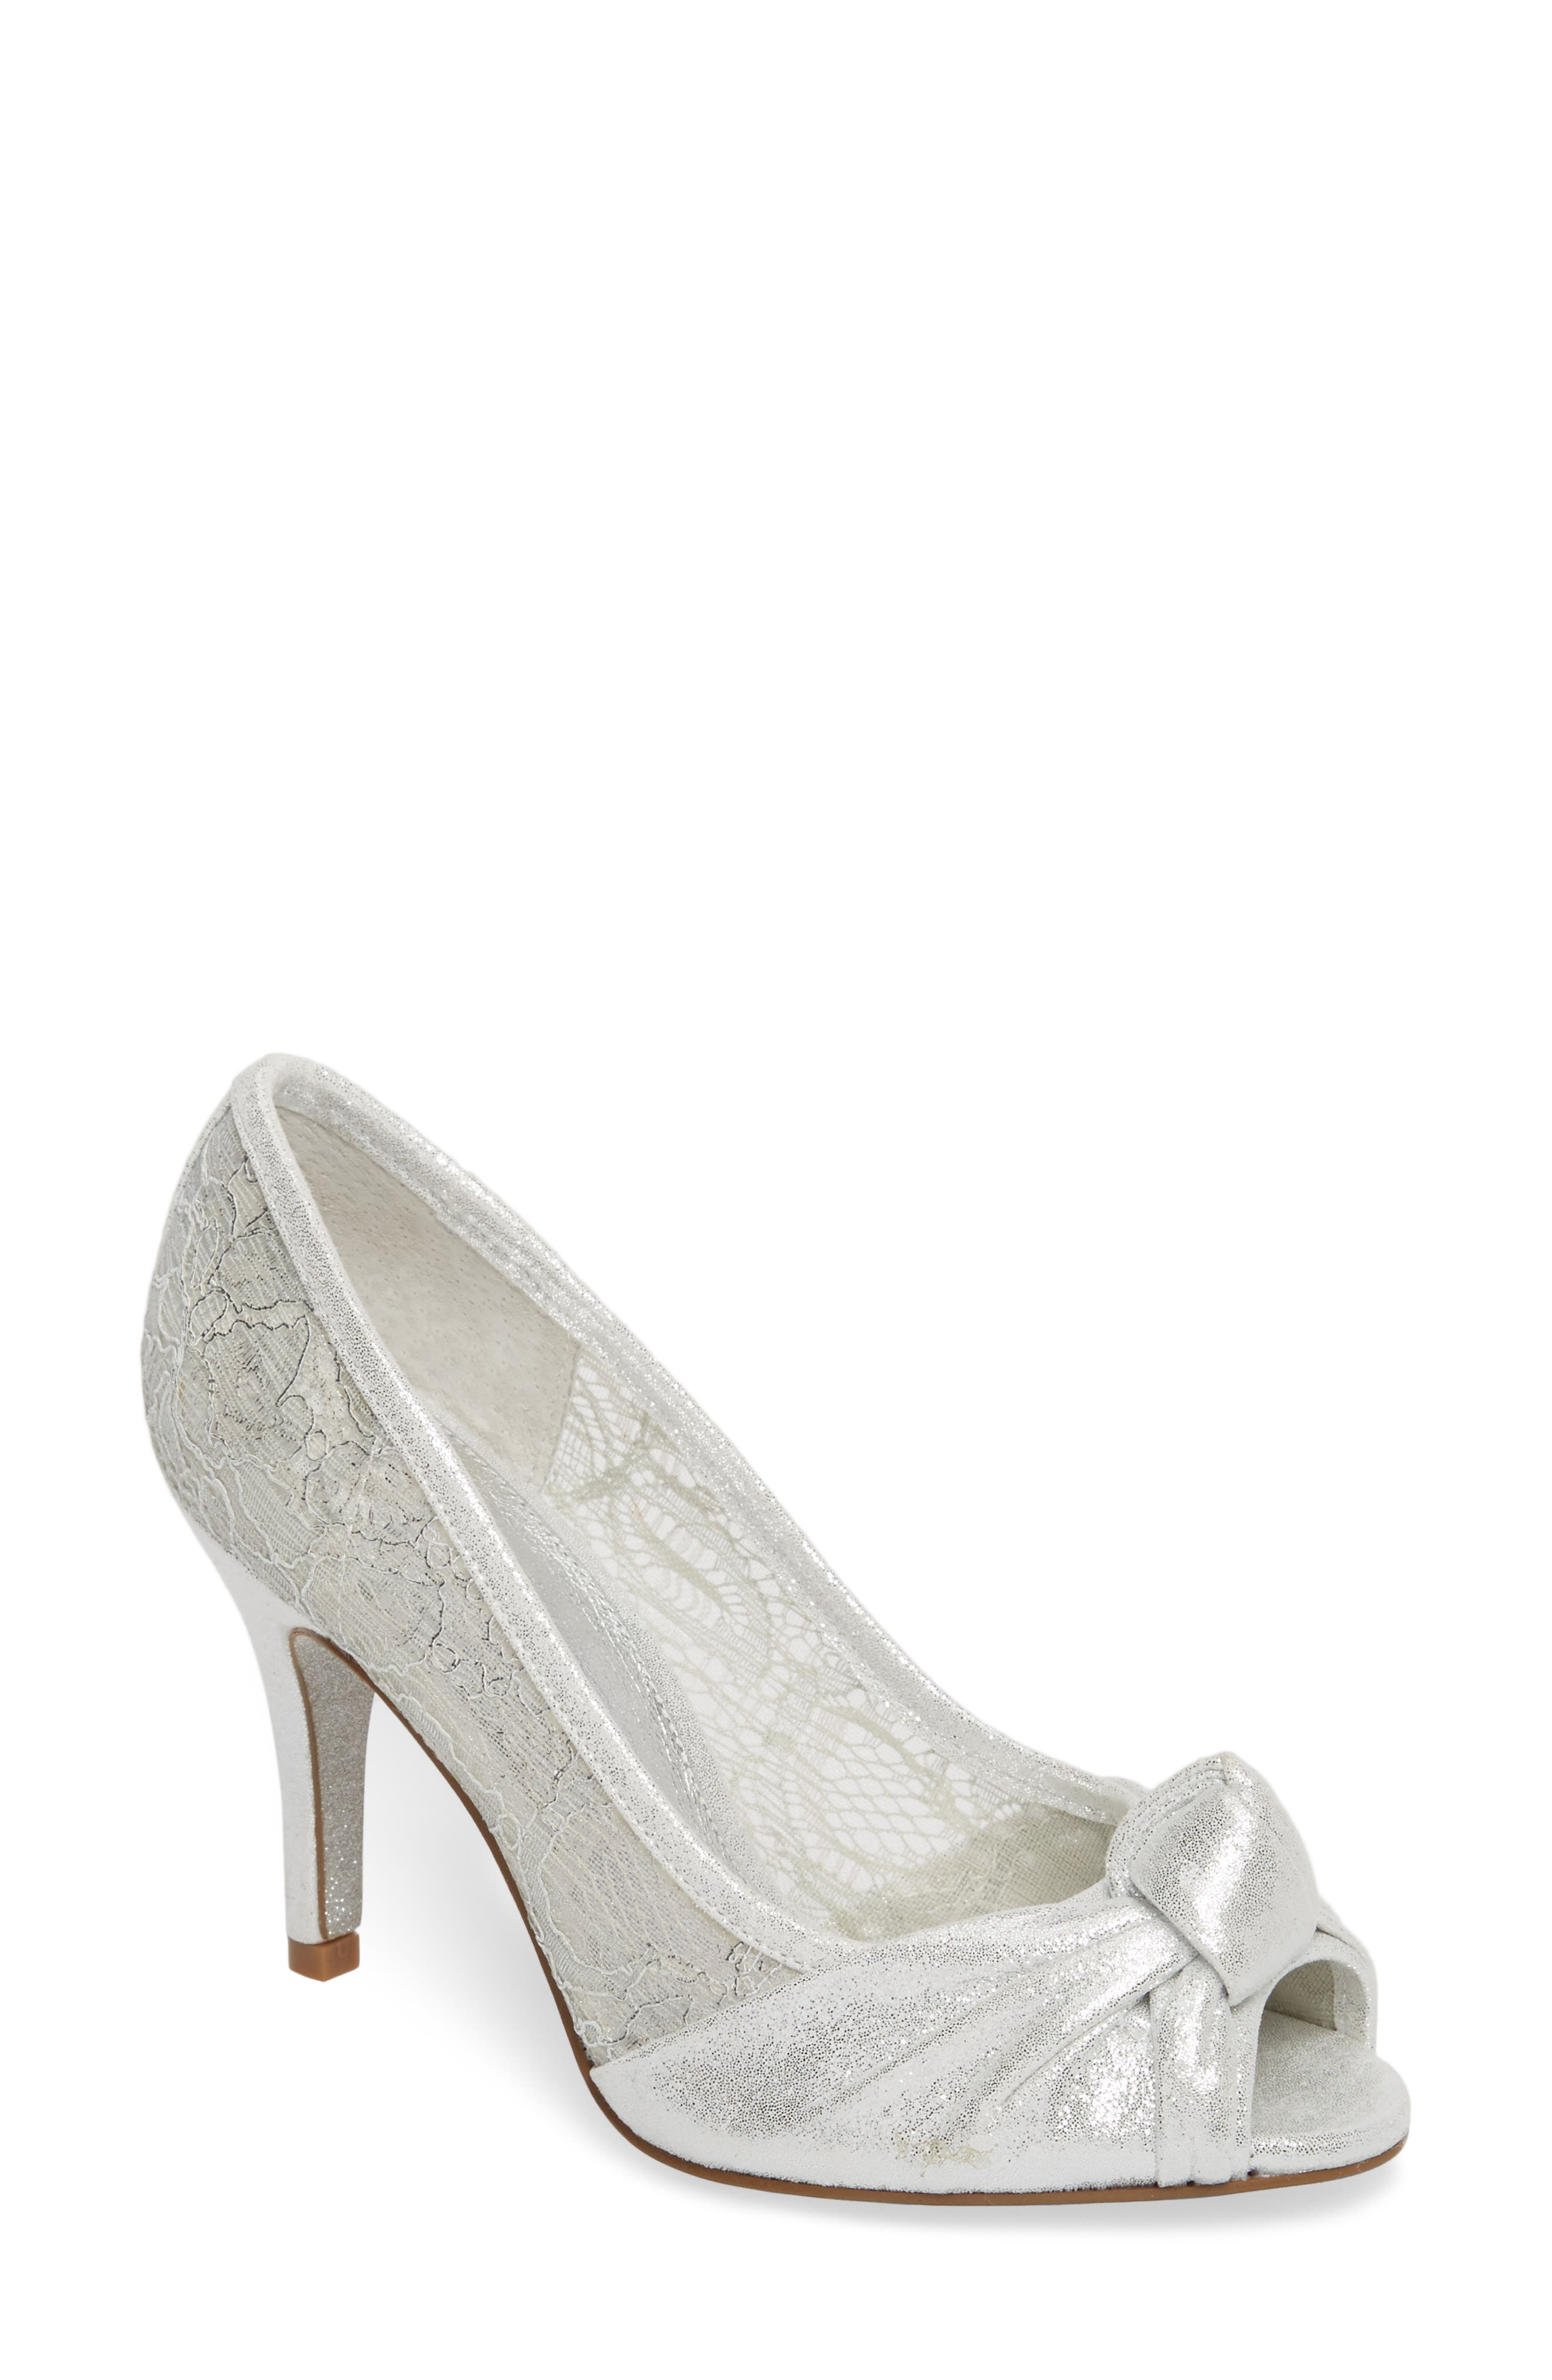 Francesca Knotted Peep Toe Pump,                         Main,                         color, Silver Satin